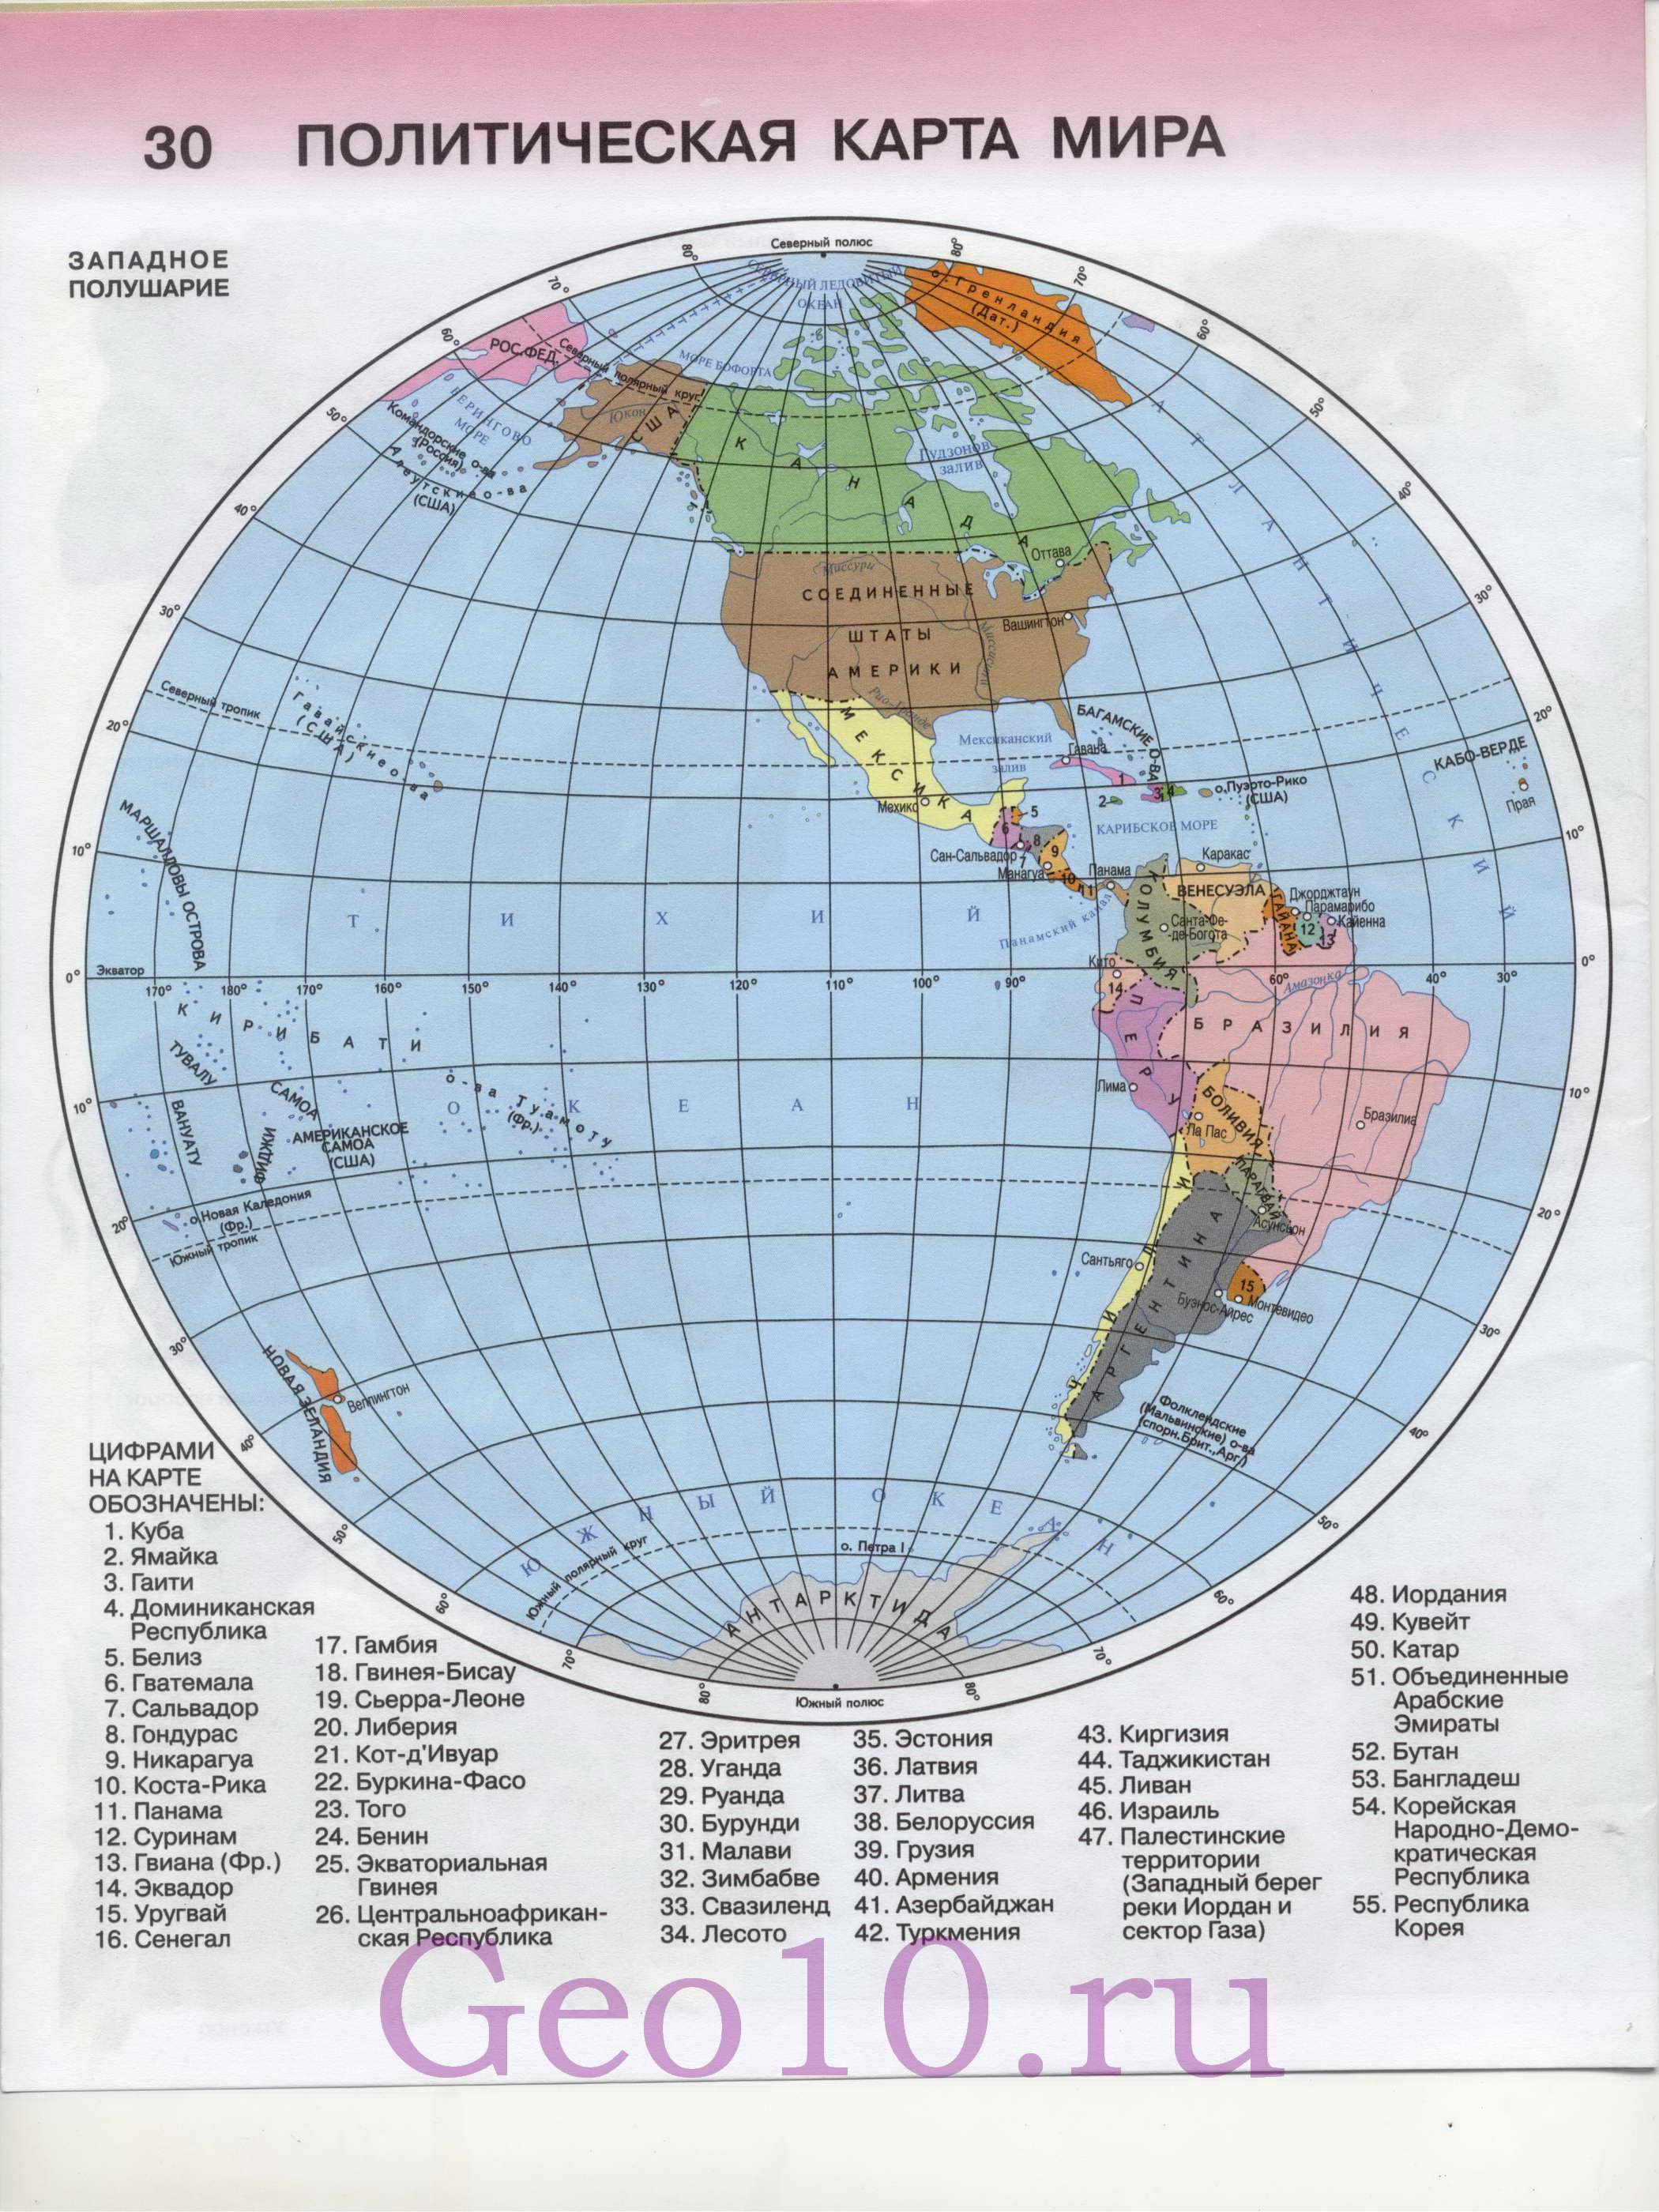 Мира с названиями стран по состоянию